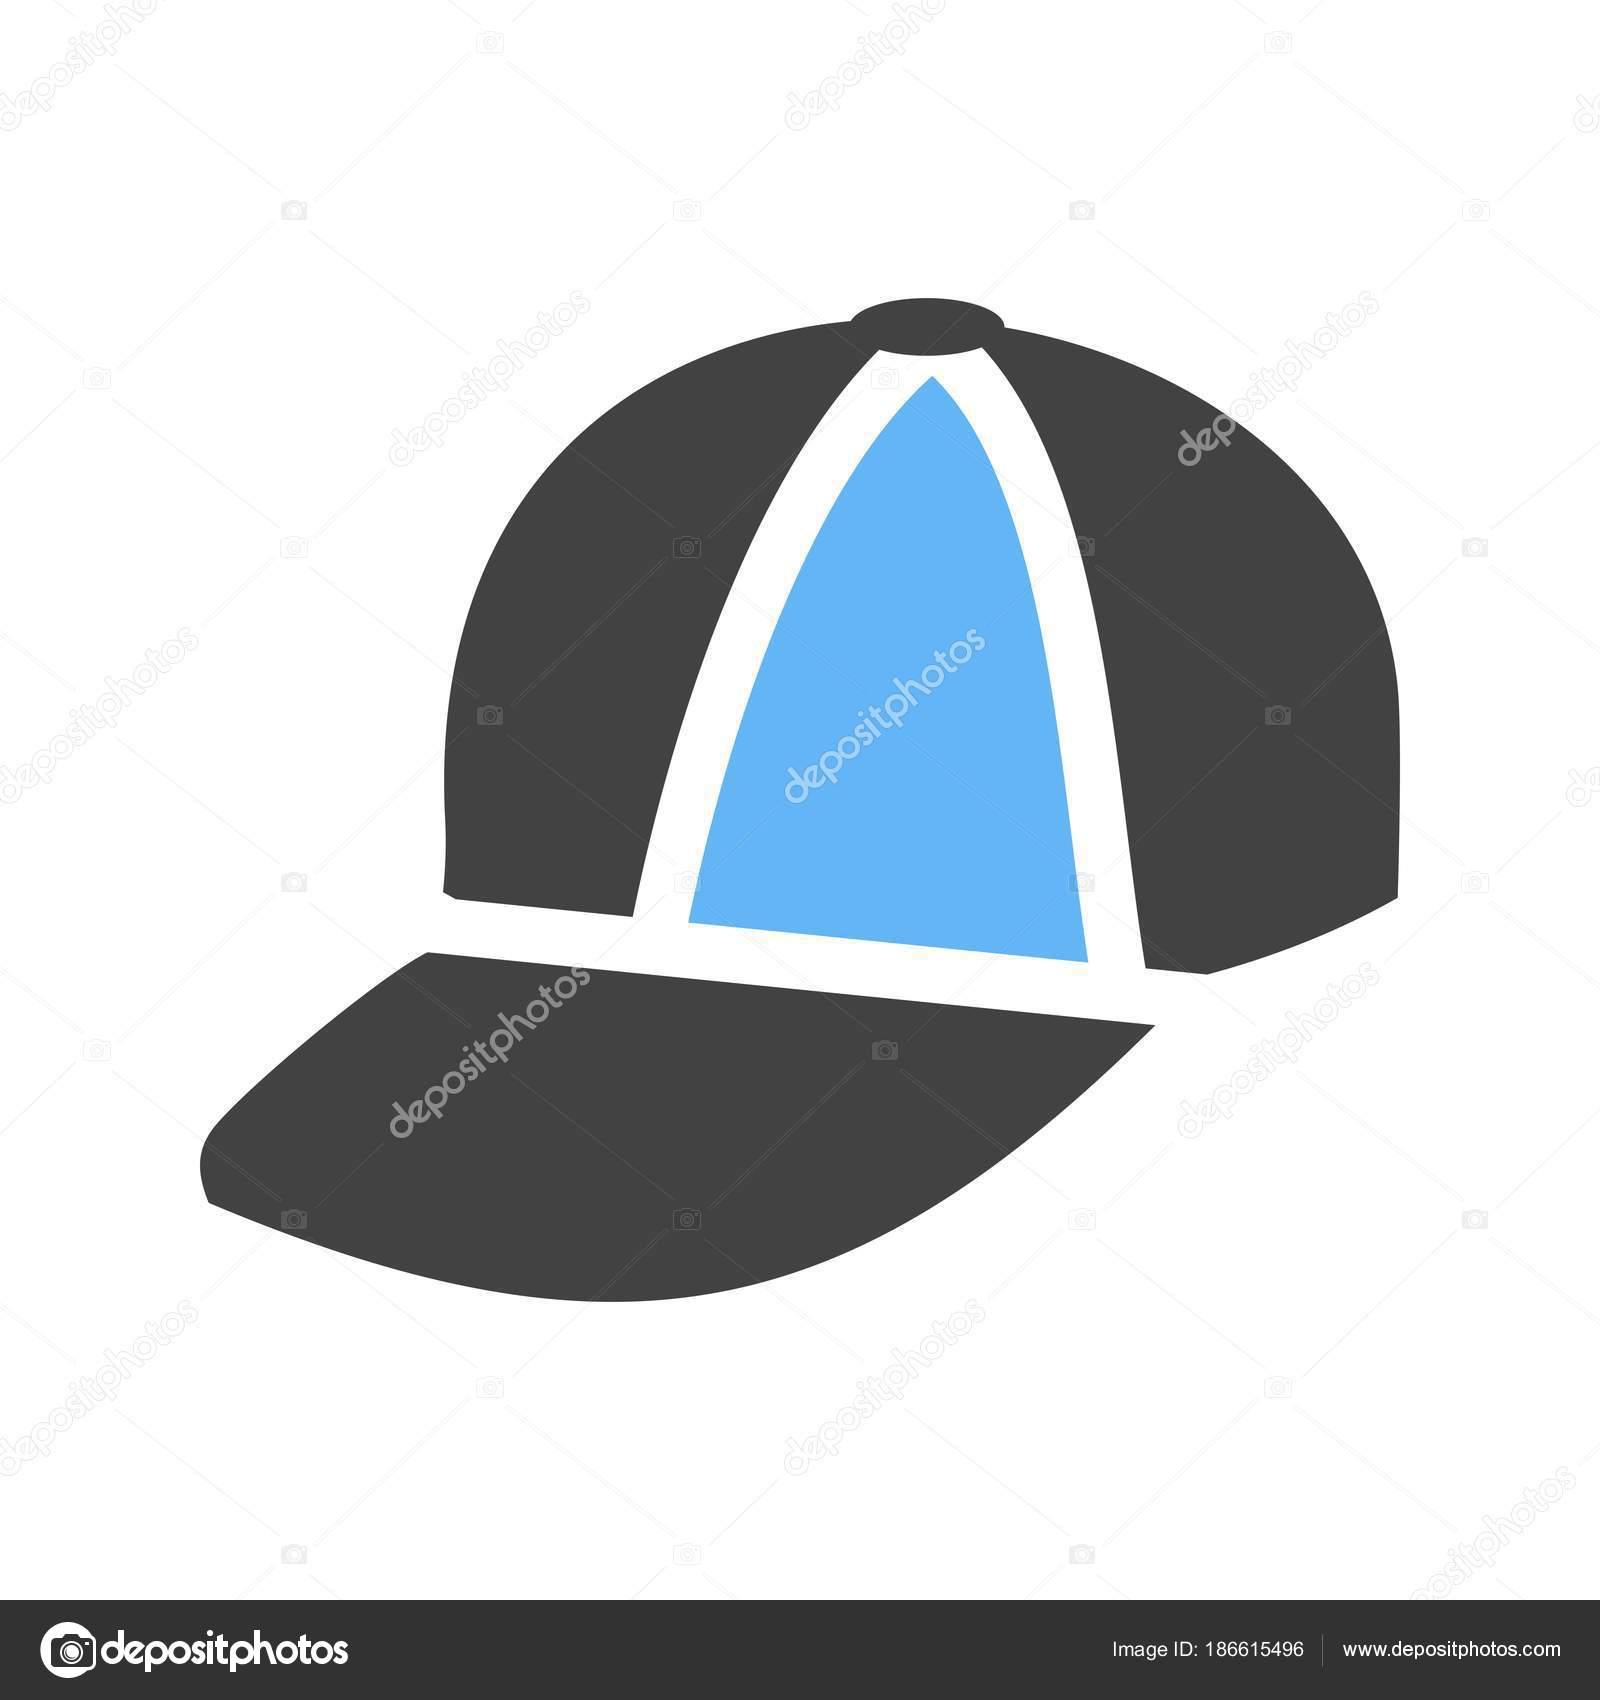 3852158cb4 Boné, chapéu, estilo — Vetores de Stock © Iconbunny #186615496